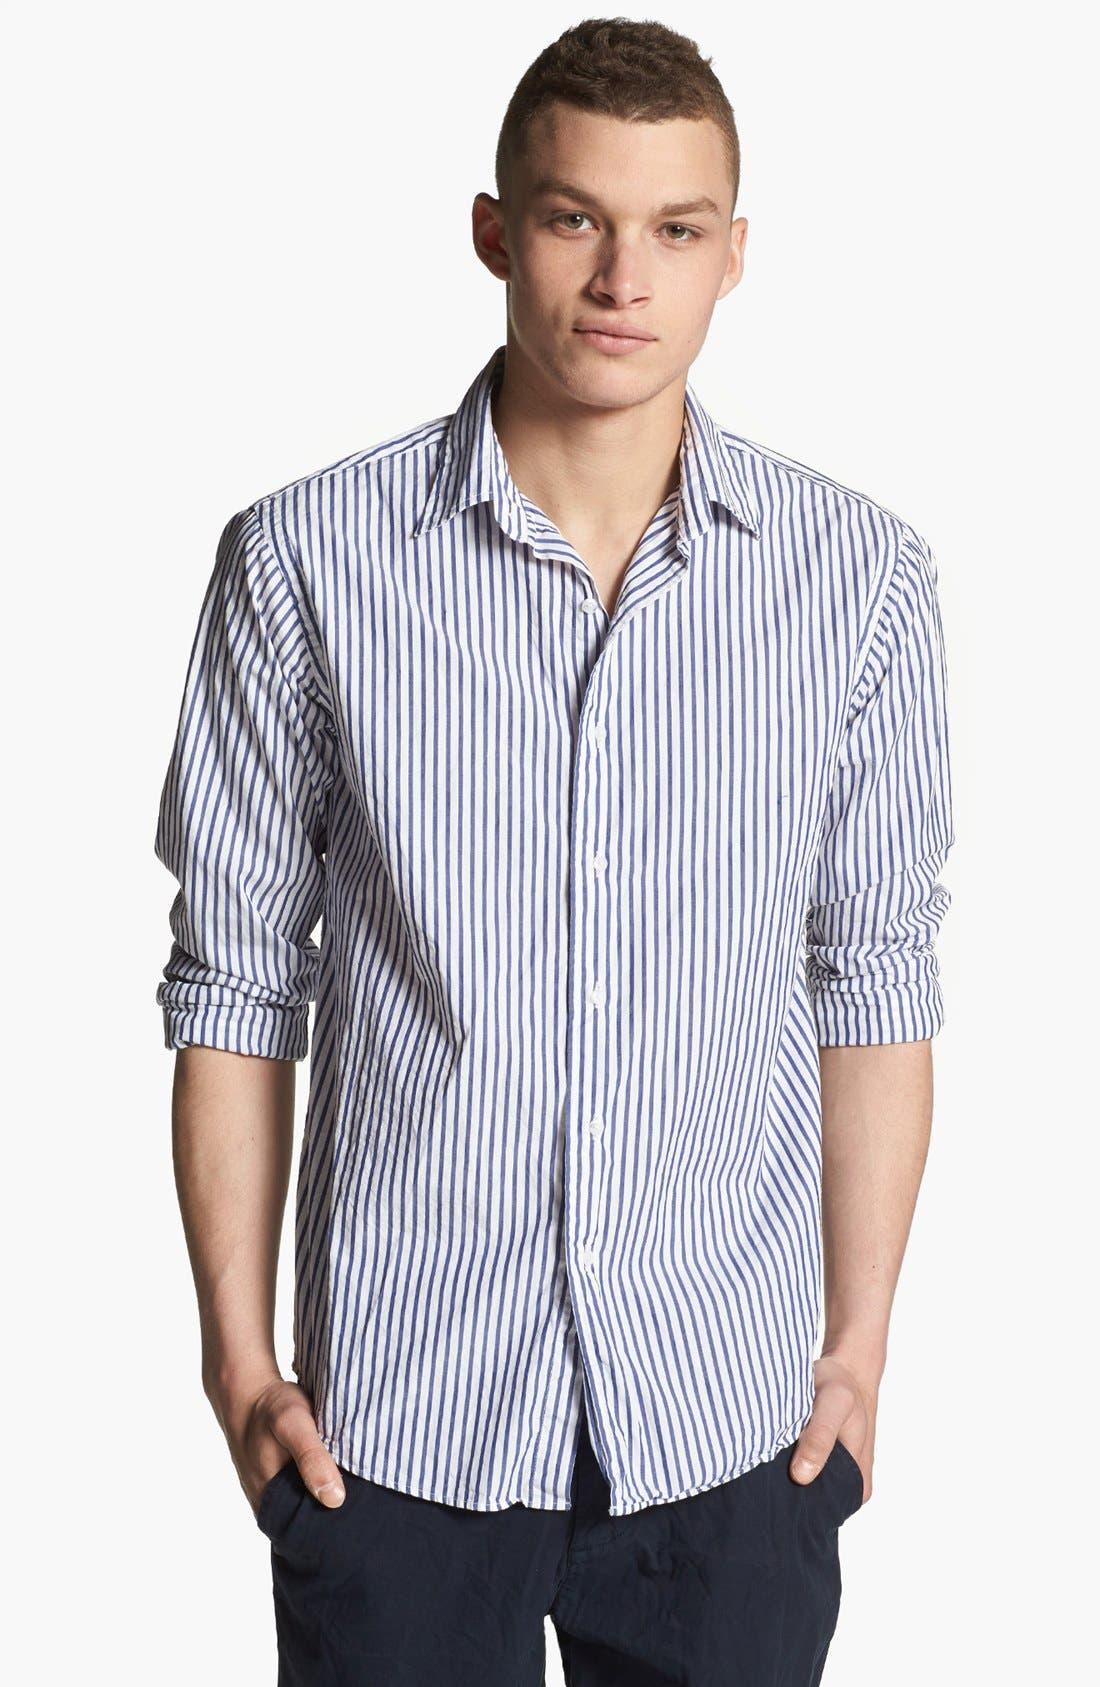 Alternate Image 1 Selected - Save Khaki Stripe Woven Shirt